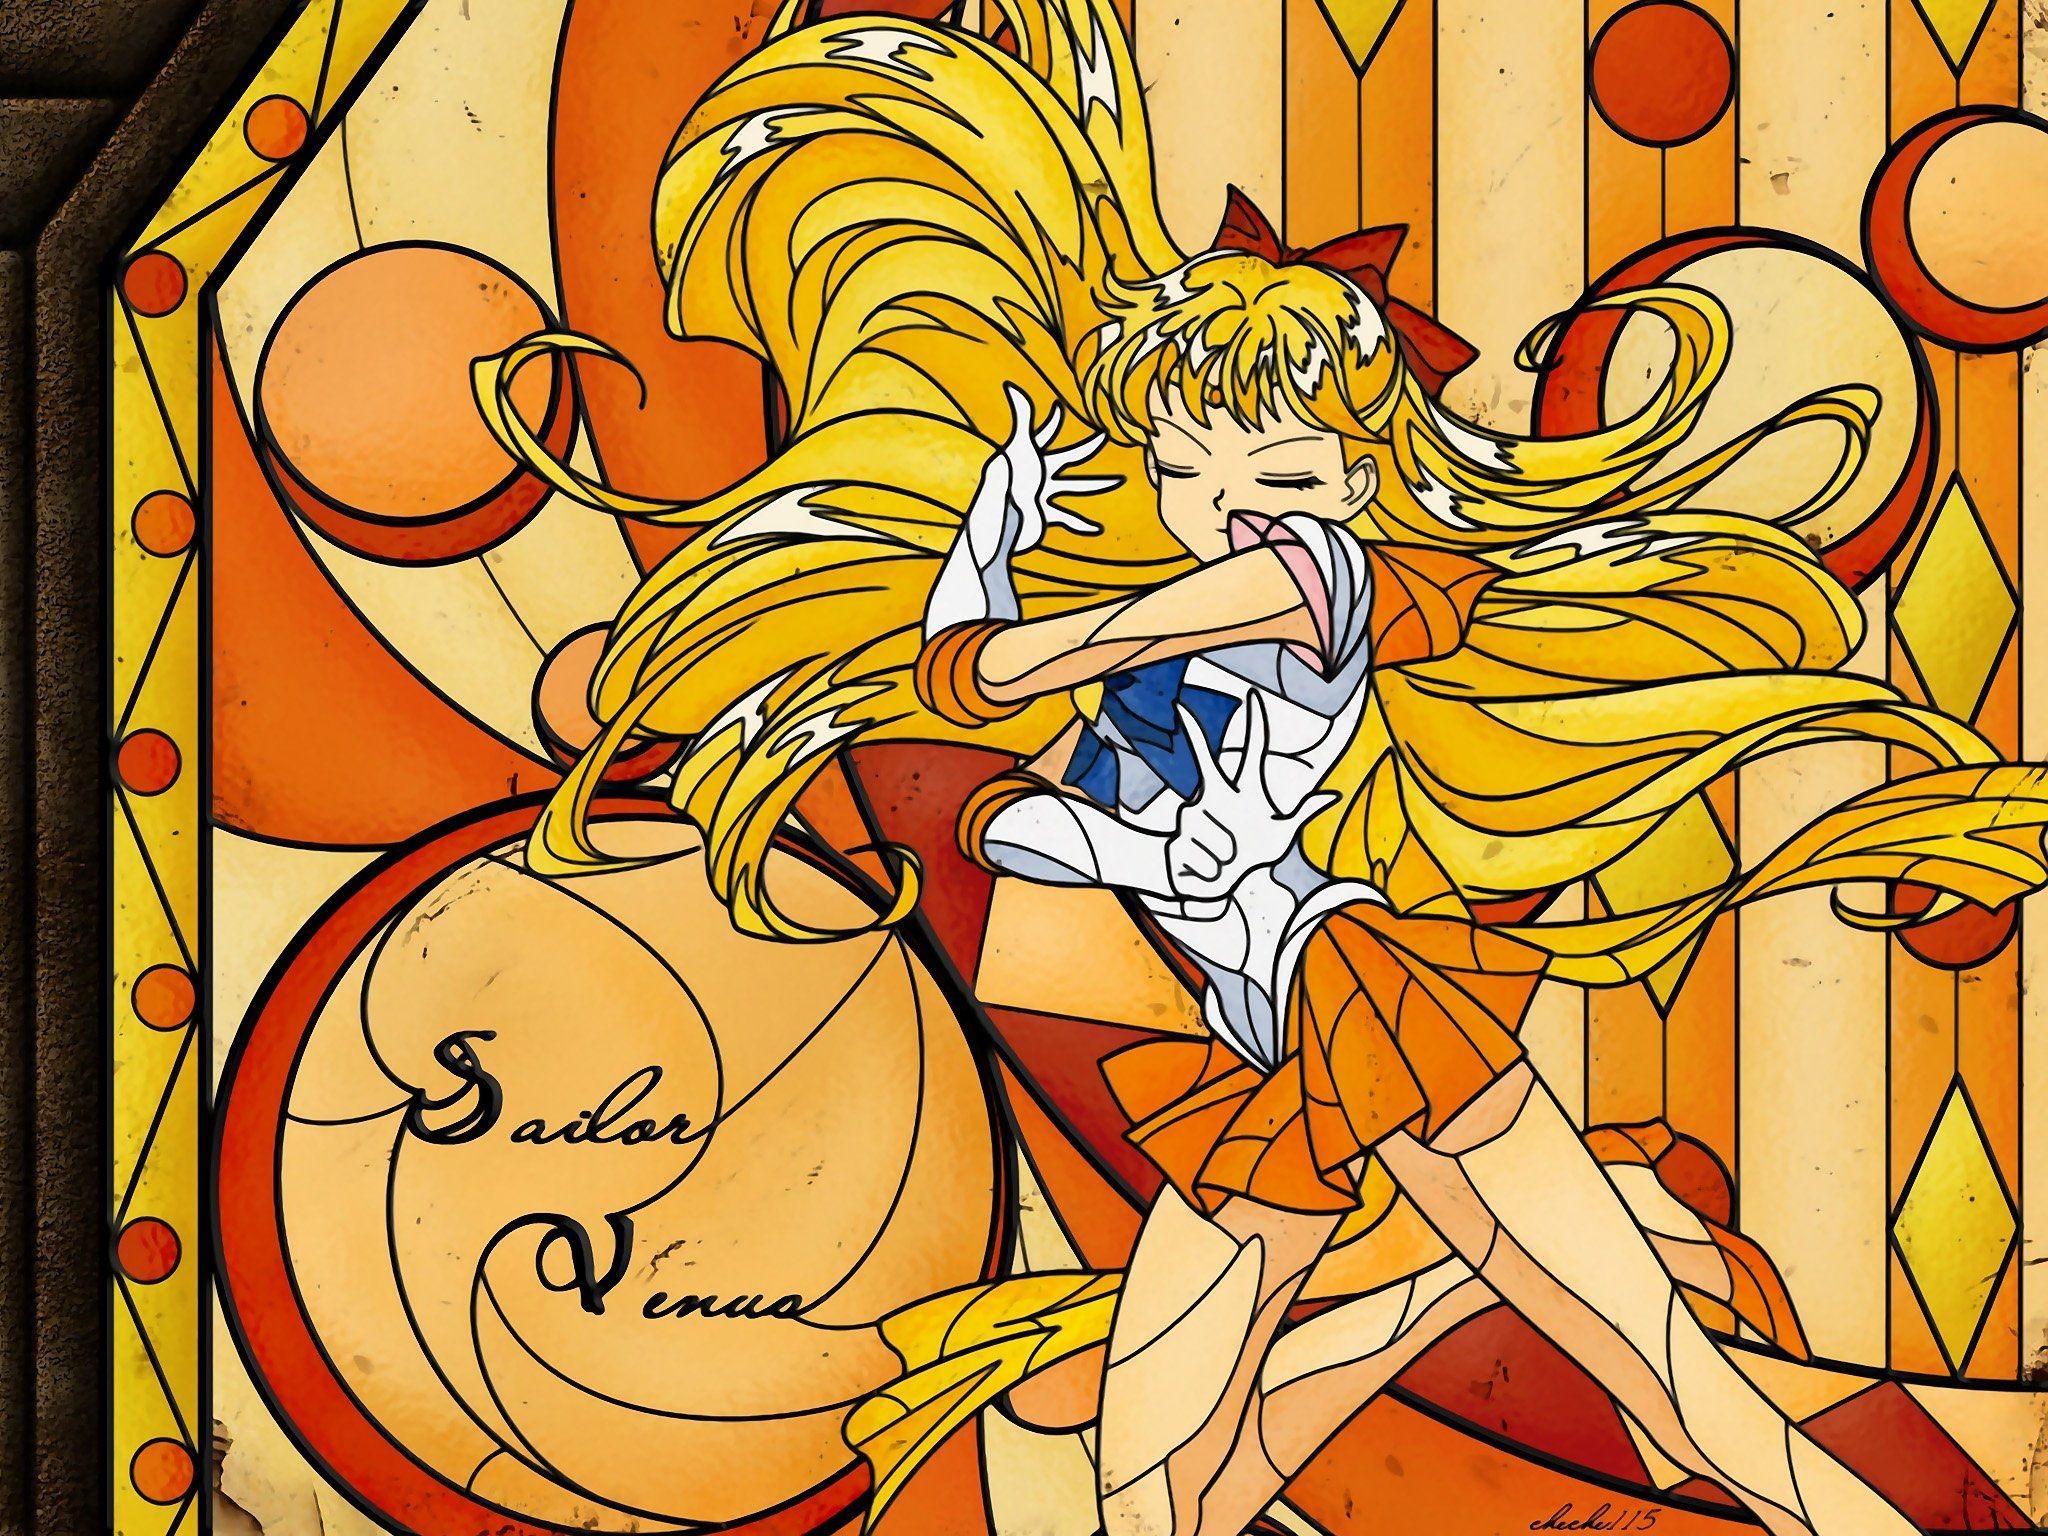 Sailor Venus sailor uniforms Bishoujo Senshi Sailor Moon wallpaper .